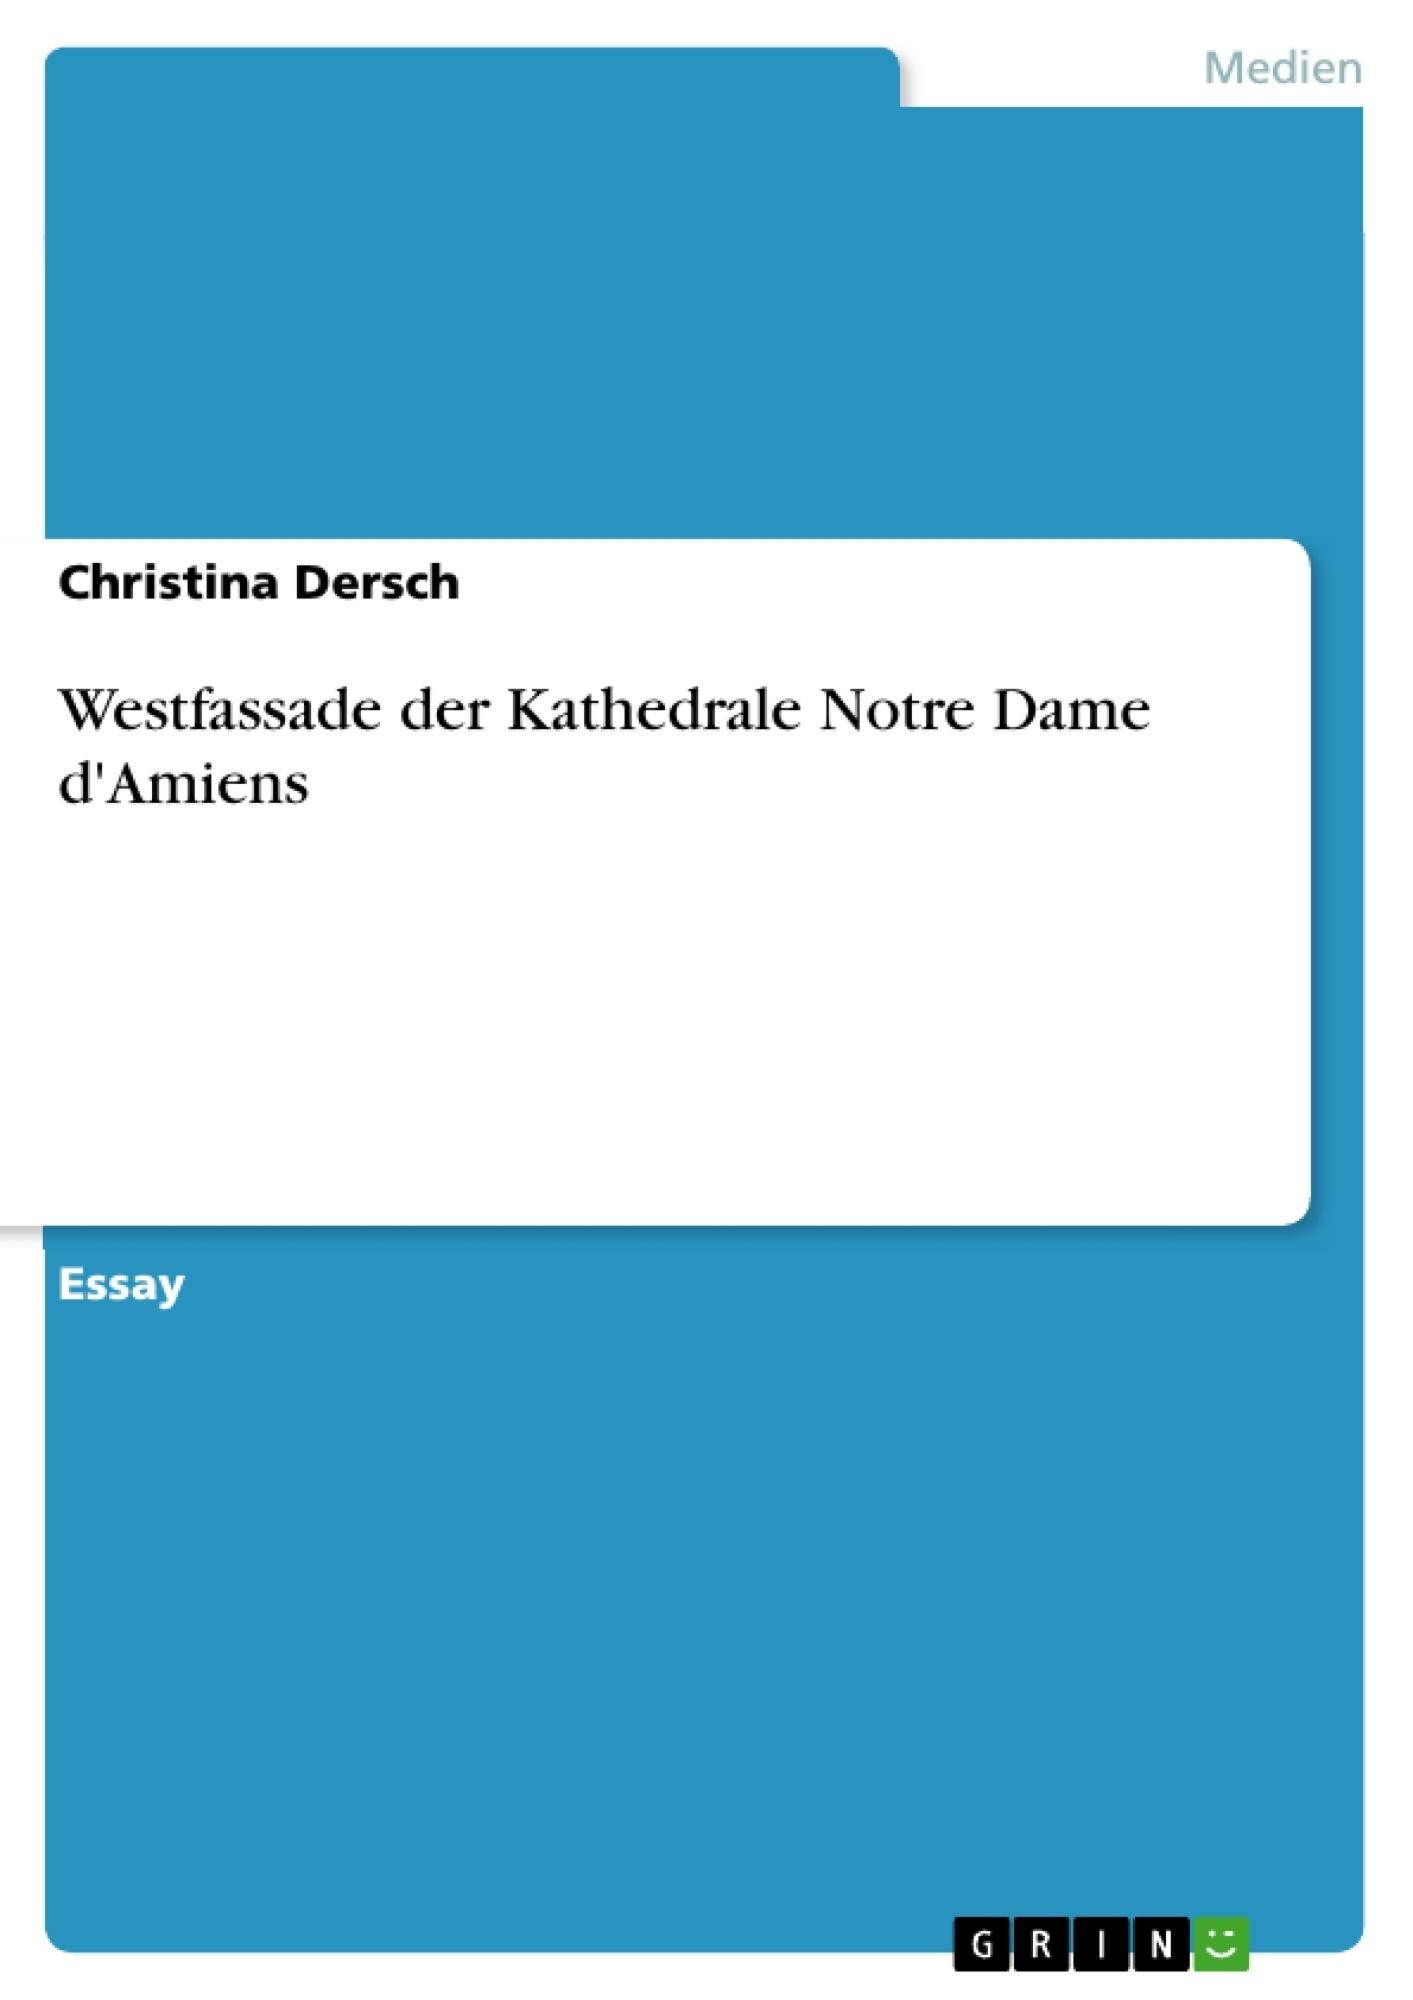 Titel: Westfassade der Kathedrale Notre Dame d'Amiens